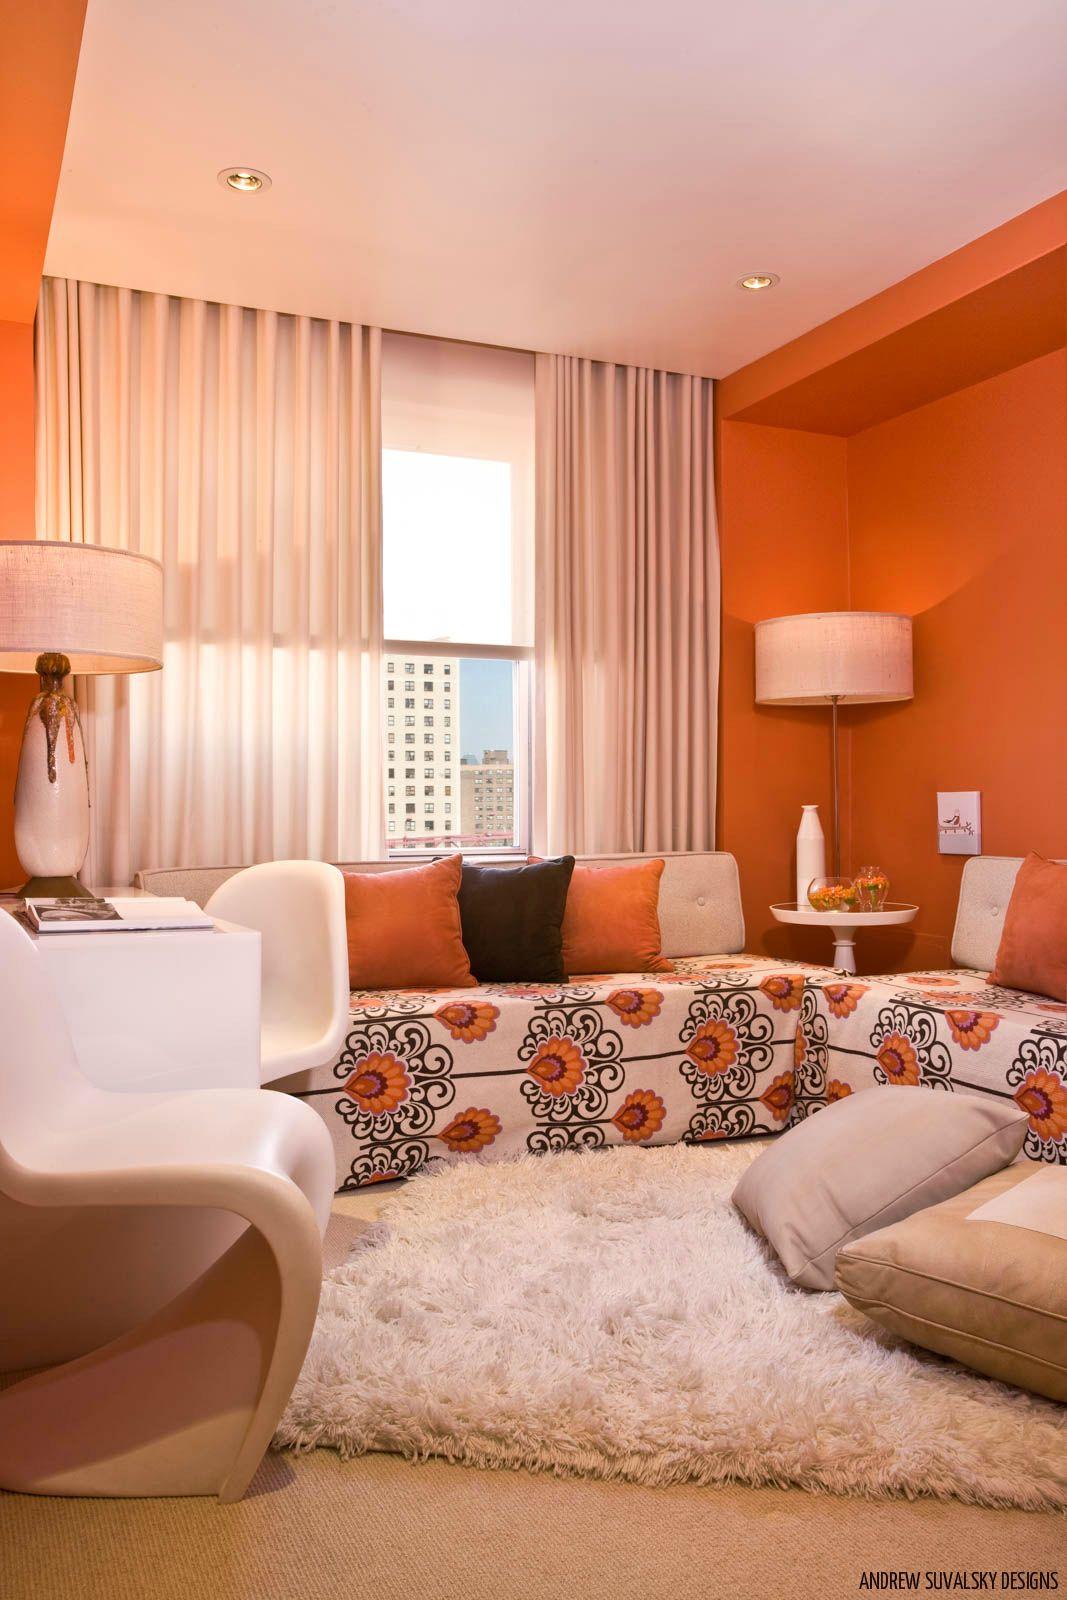 #MondayMood It's fresh, fun and modern : #Orange brings ... on Fun Living Room Ideas  id=42958